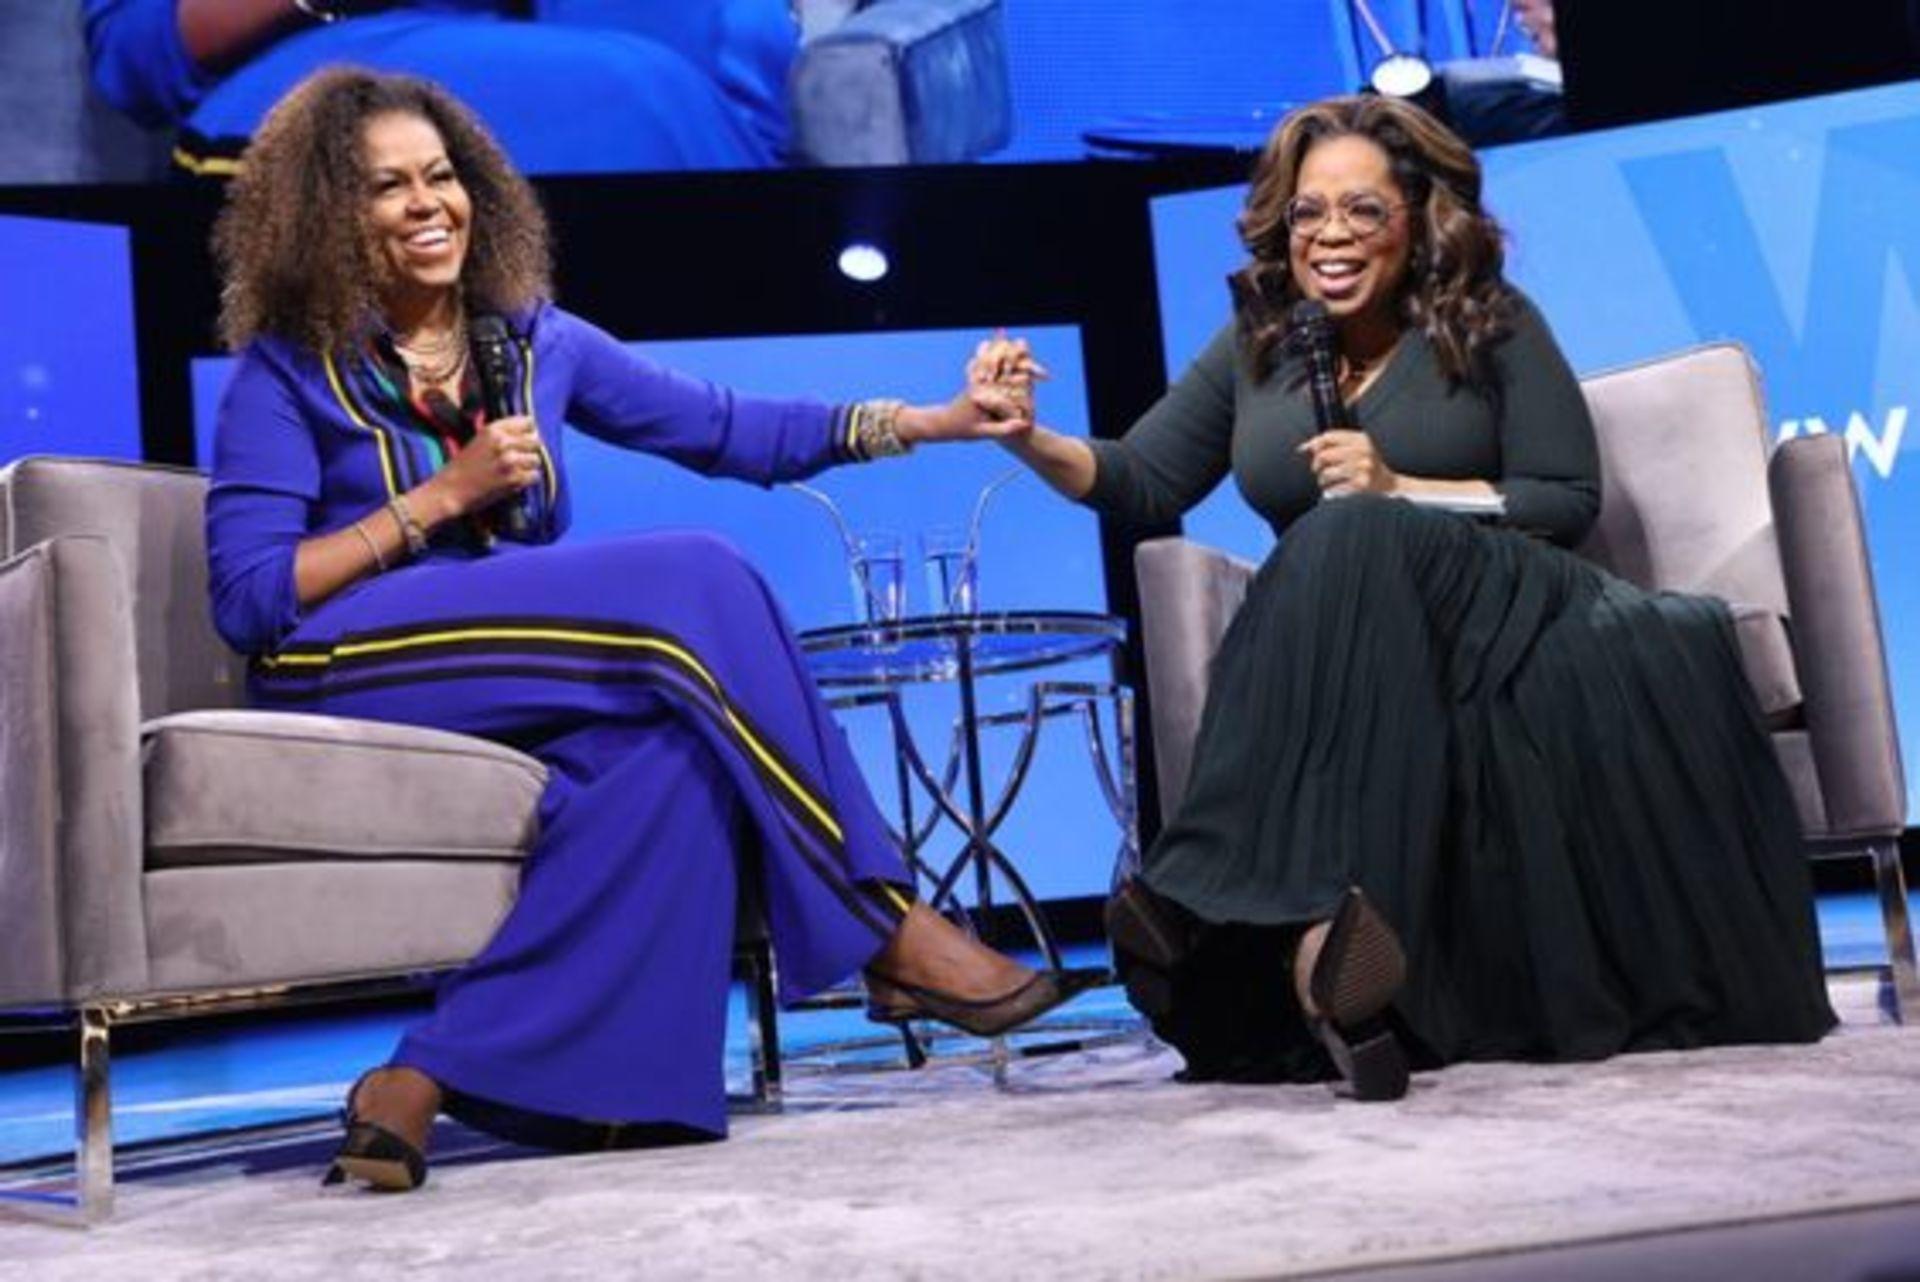 Les femmes d'influence au XXIe siècle